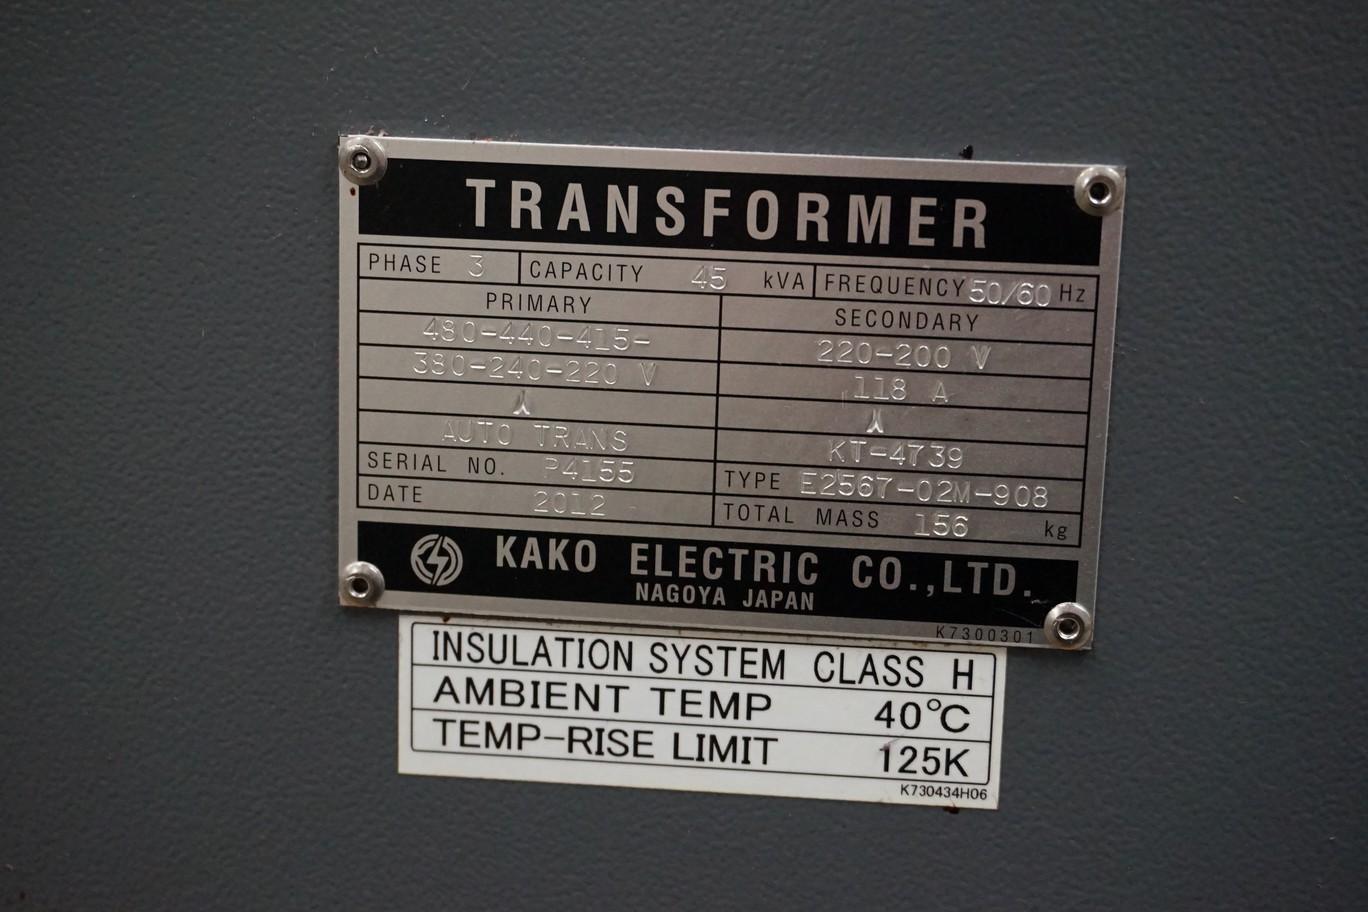 Kako Electric 480-220V, 45 Kva Transformer - Image 2 of 2